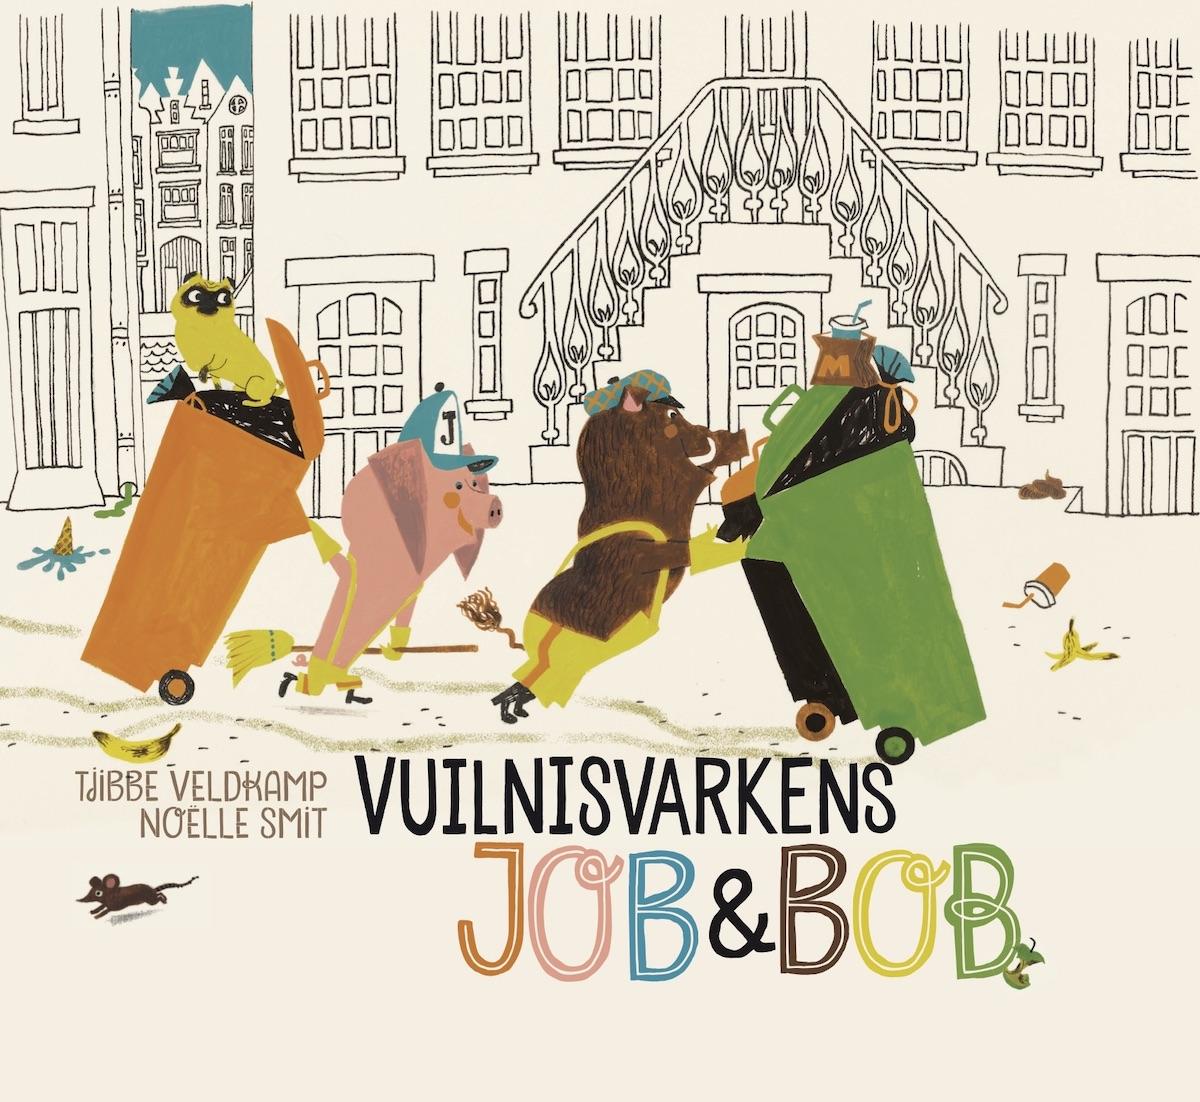 Noëlle Smit - Vuilnisvarkens Job en Bob